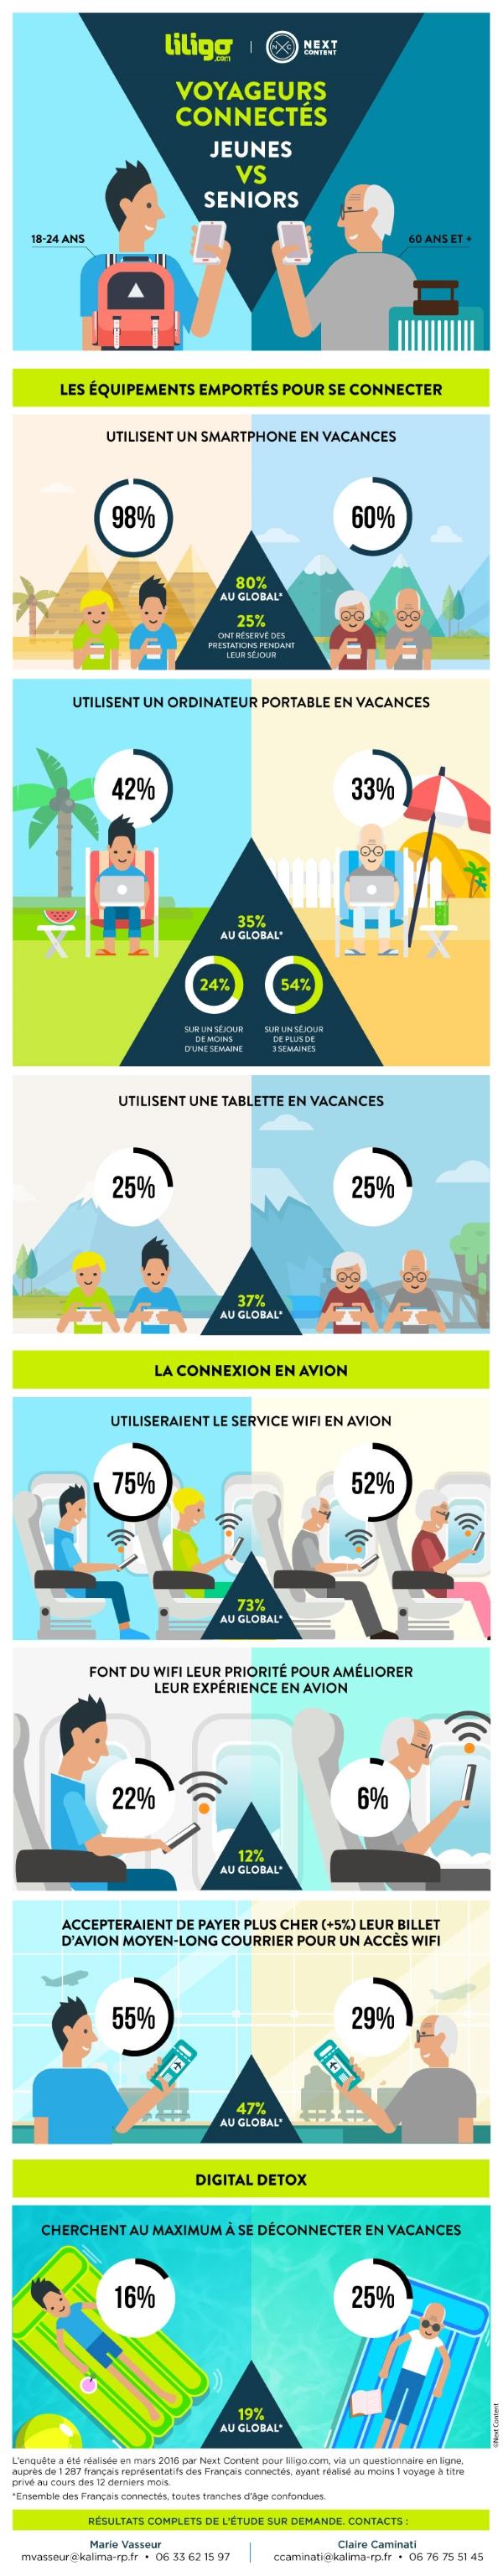 voyageurs-connectes-jeunes-vs-seniors_LILIGO.com-2